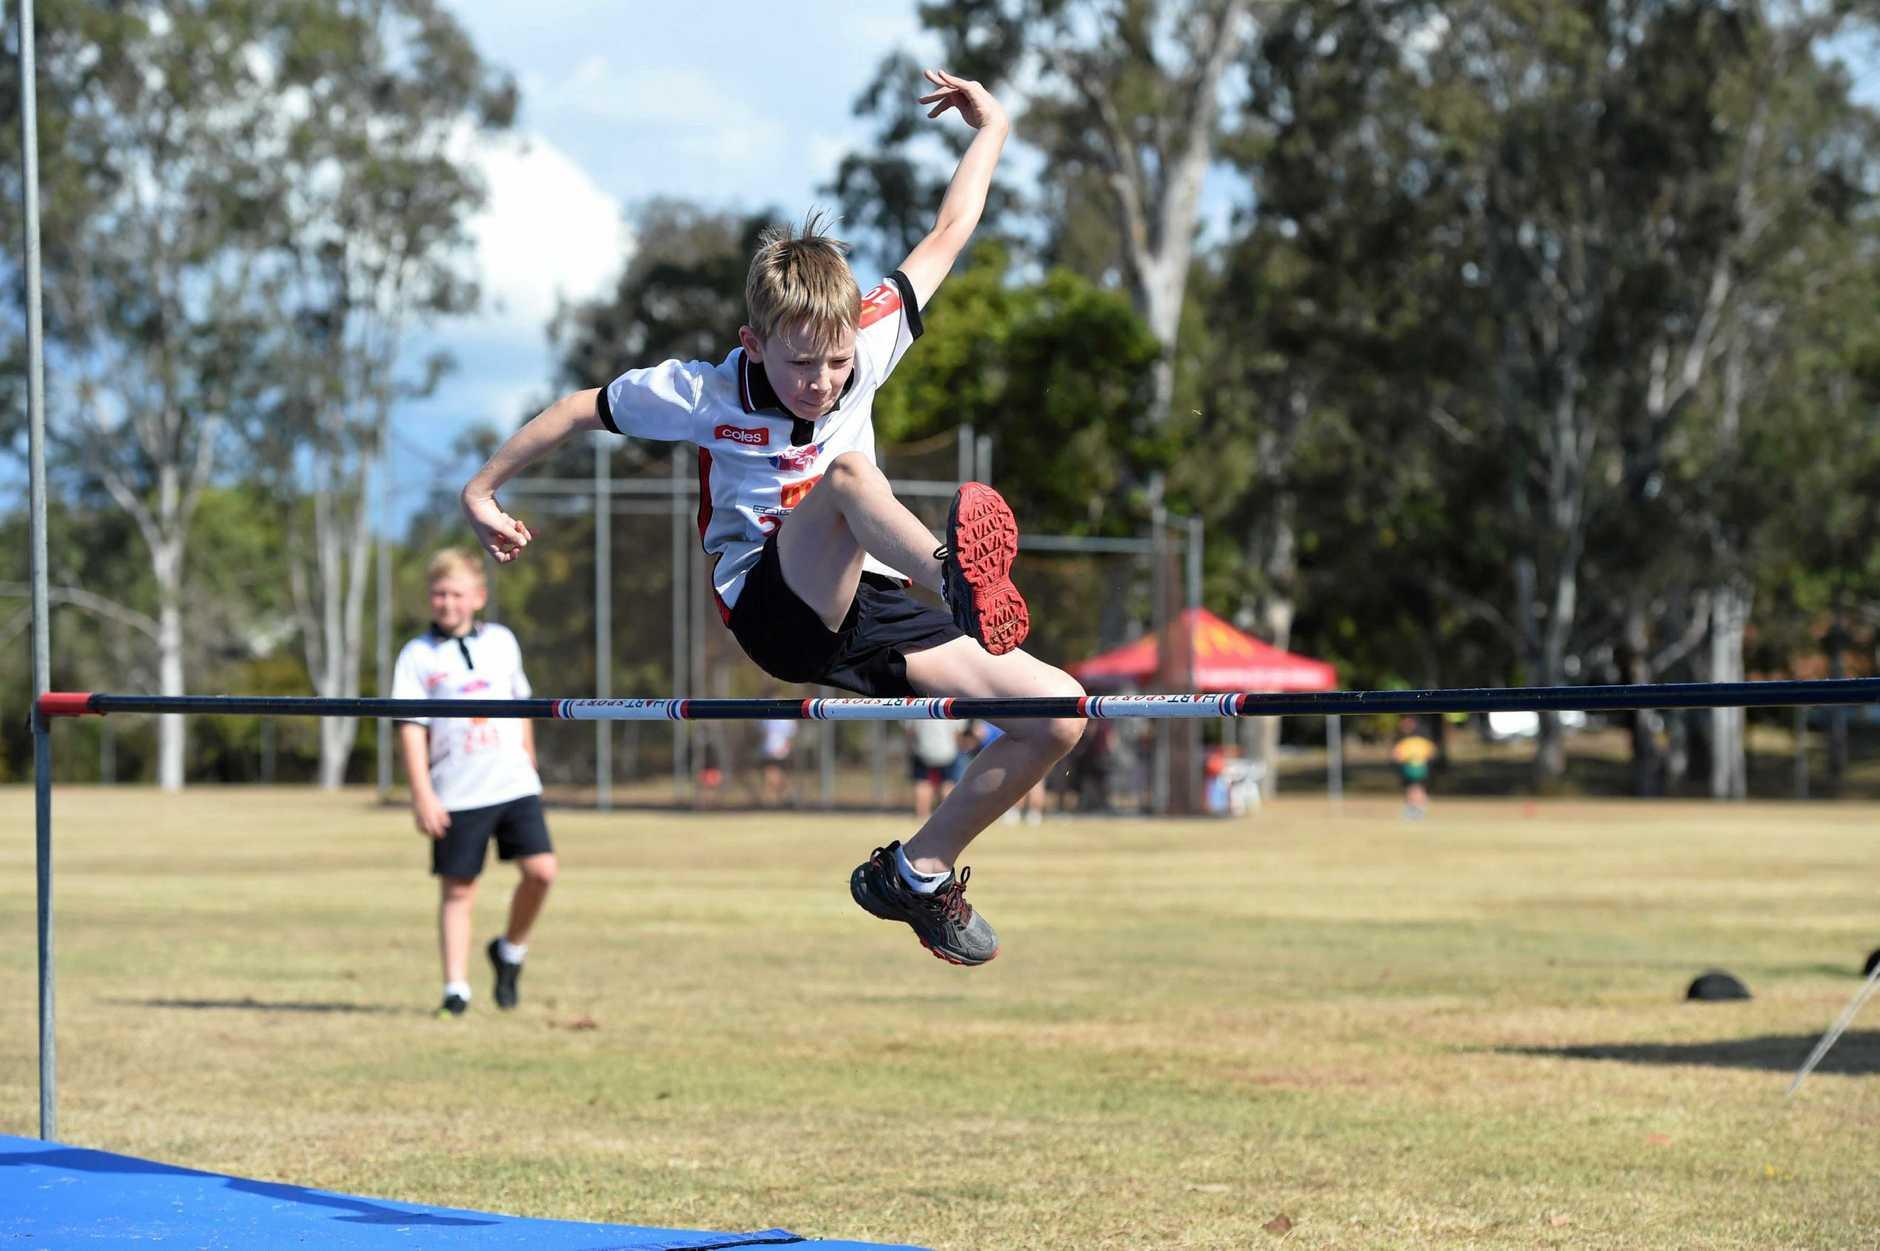 Maryborough's Angus Cameron in high jump.